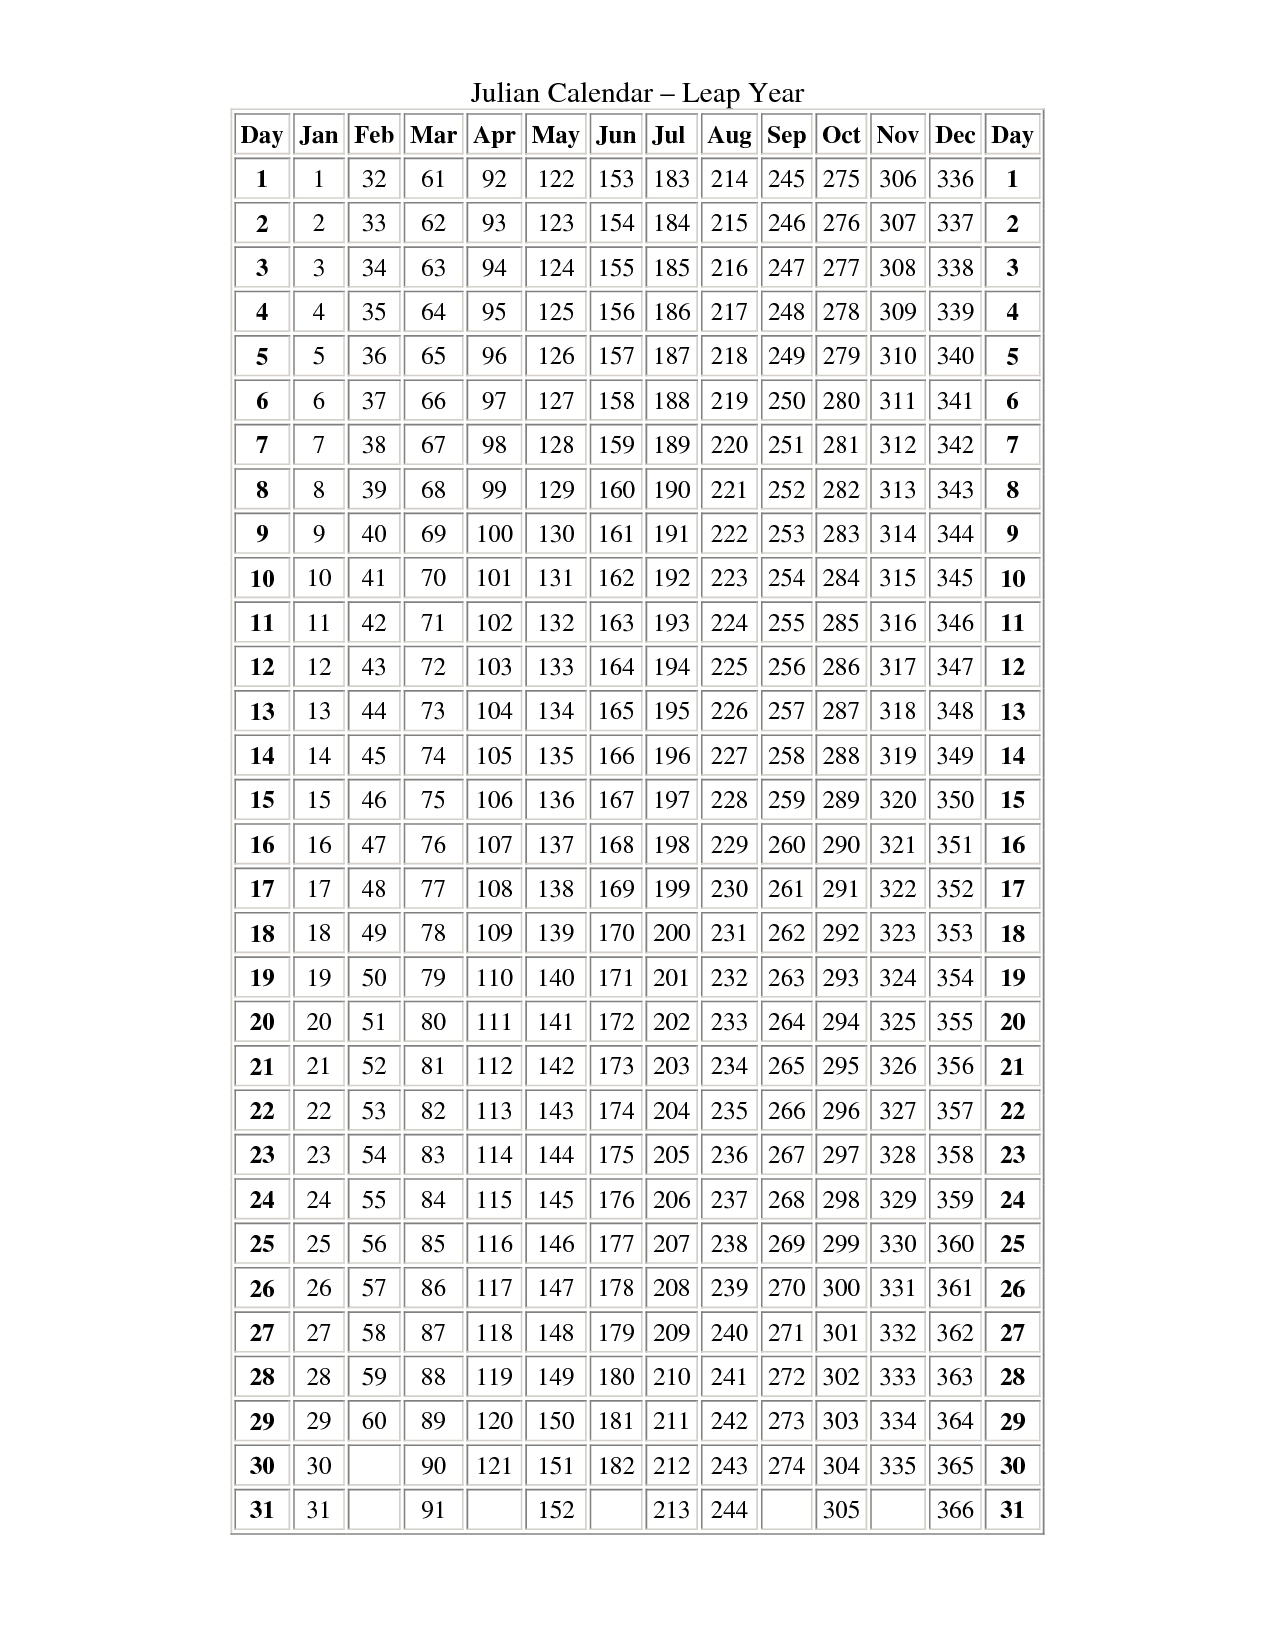 Julian Calendar Leap Year And Non Leap Year | Printable Calendar Template 2020